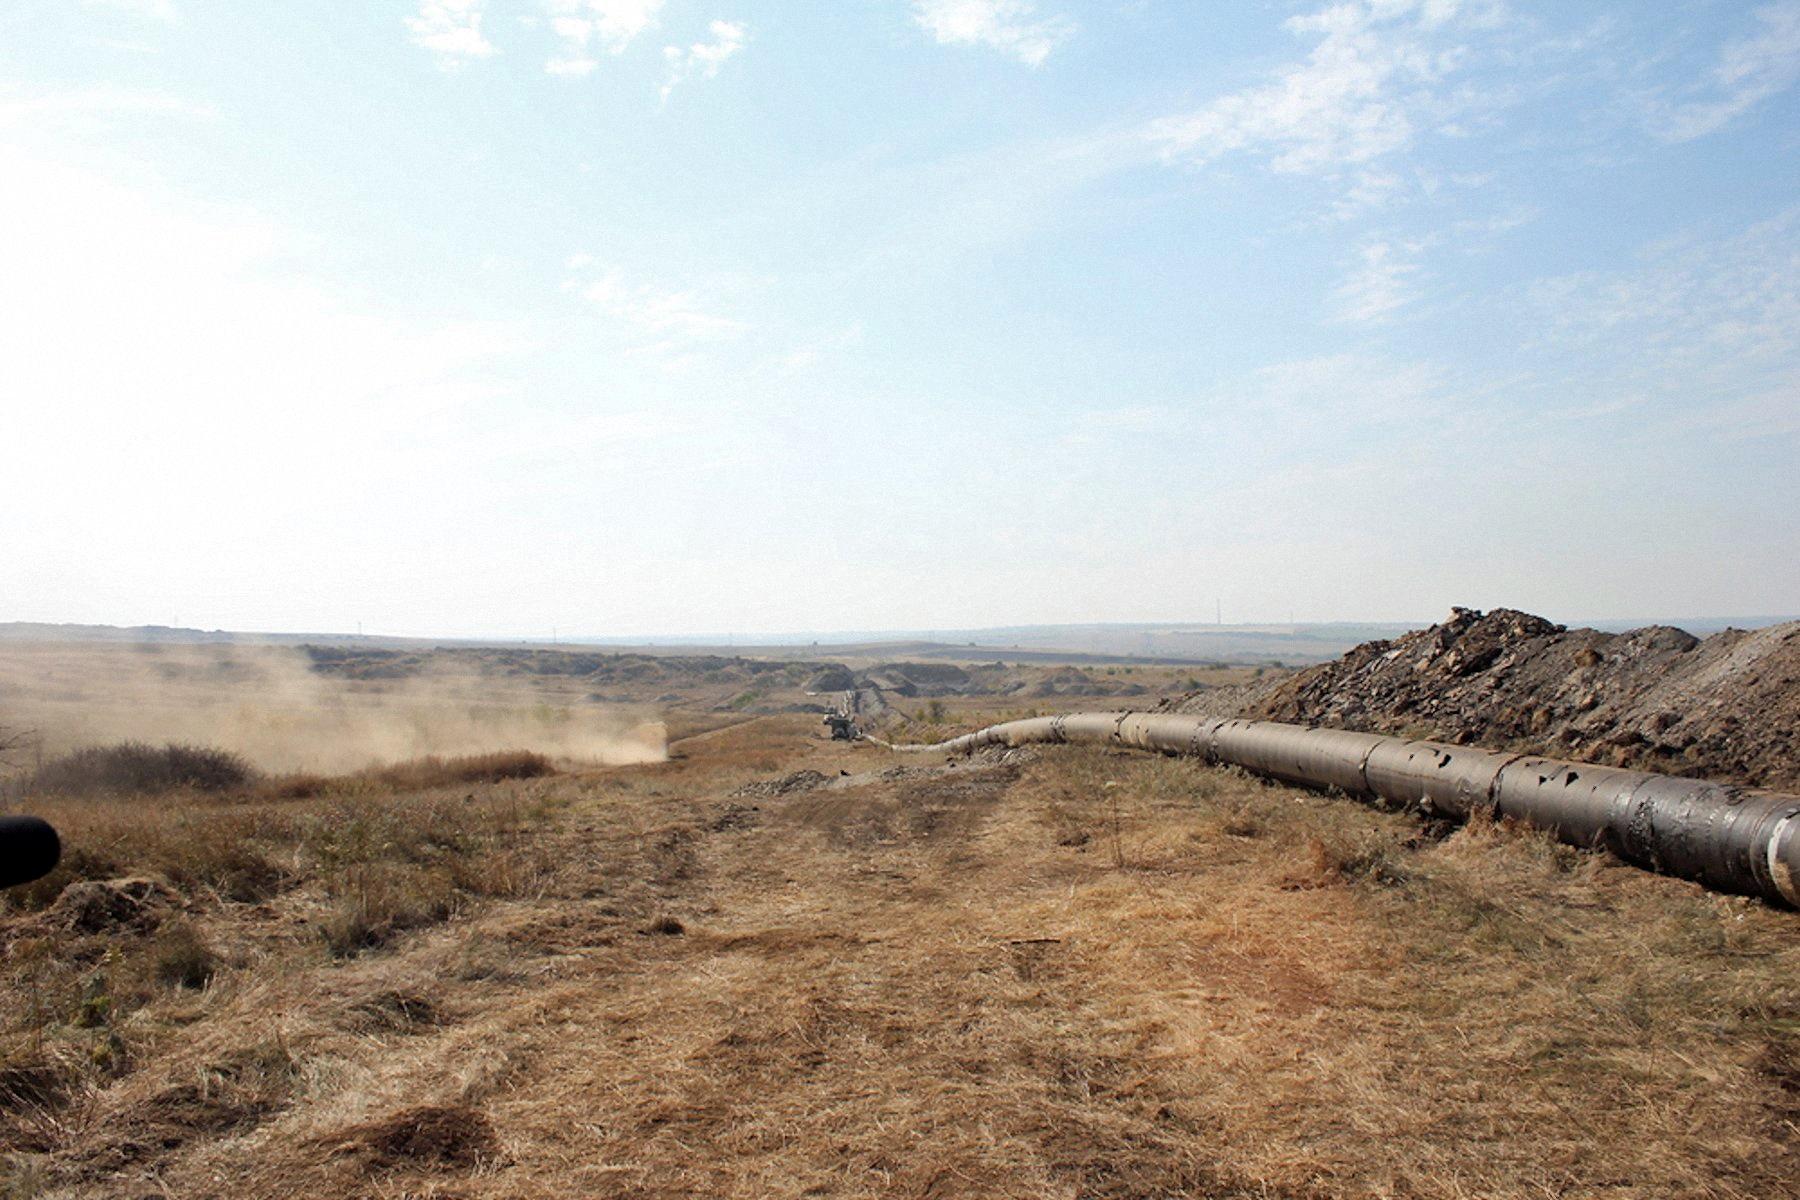 00 lnr reservoir lugansk pr 04 091015